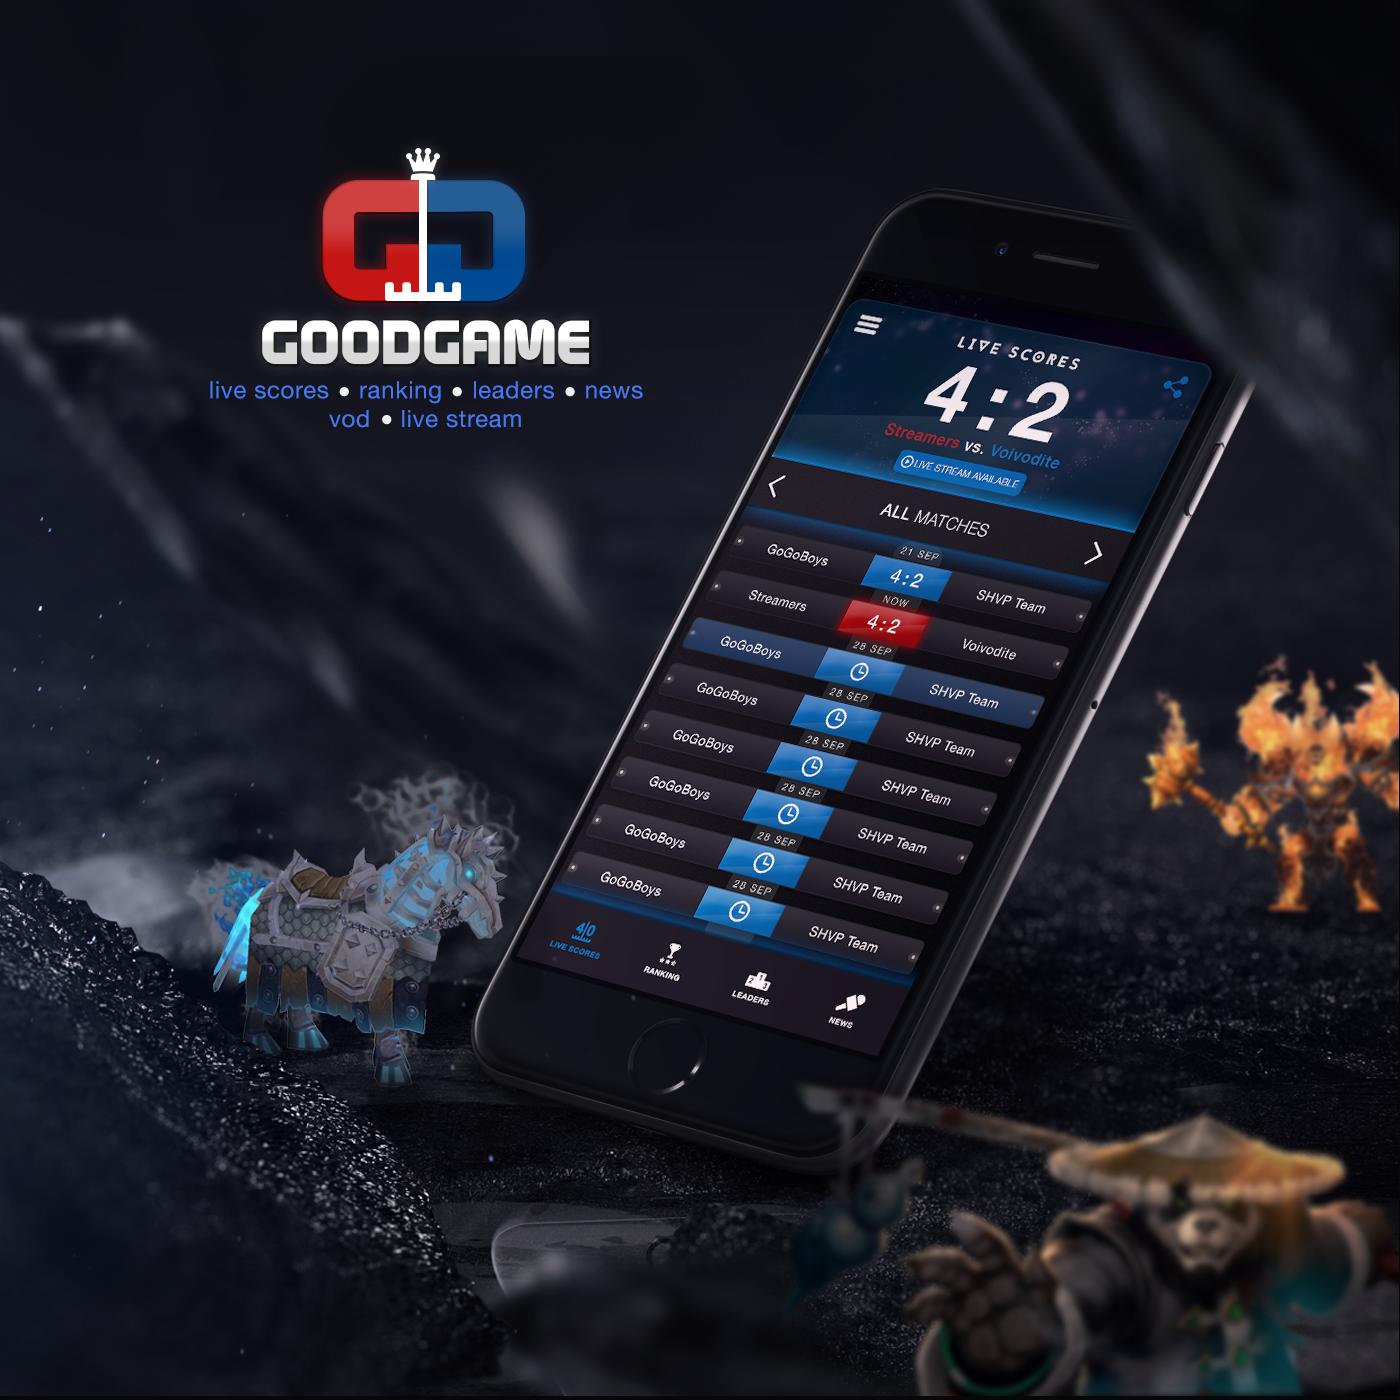 Good game gg warcraft cs counter strike Gamers live scores app Hearth Stone DOTA dota2 wow lemun